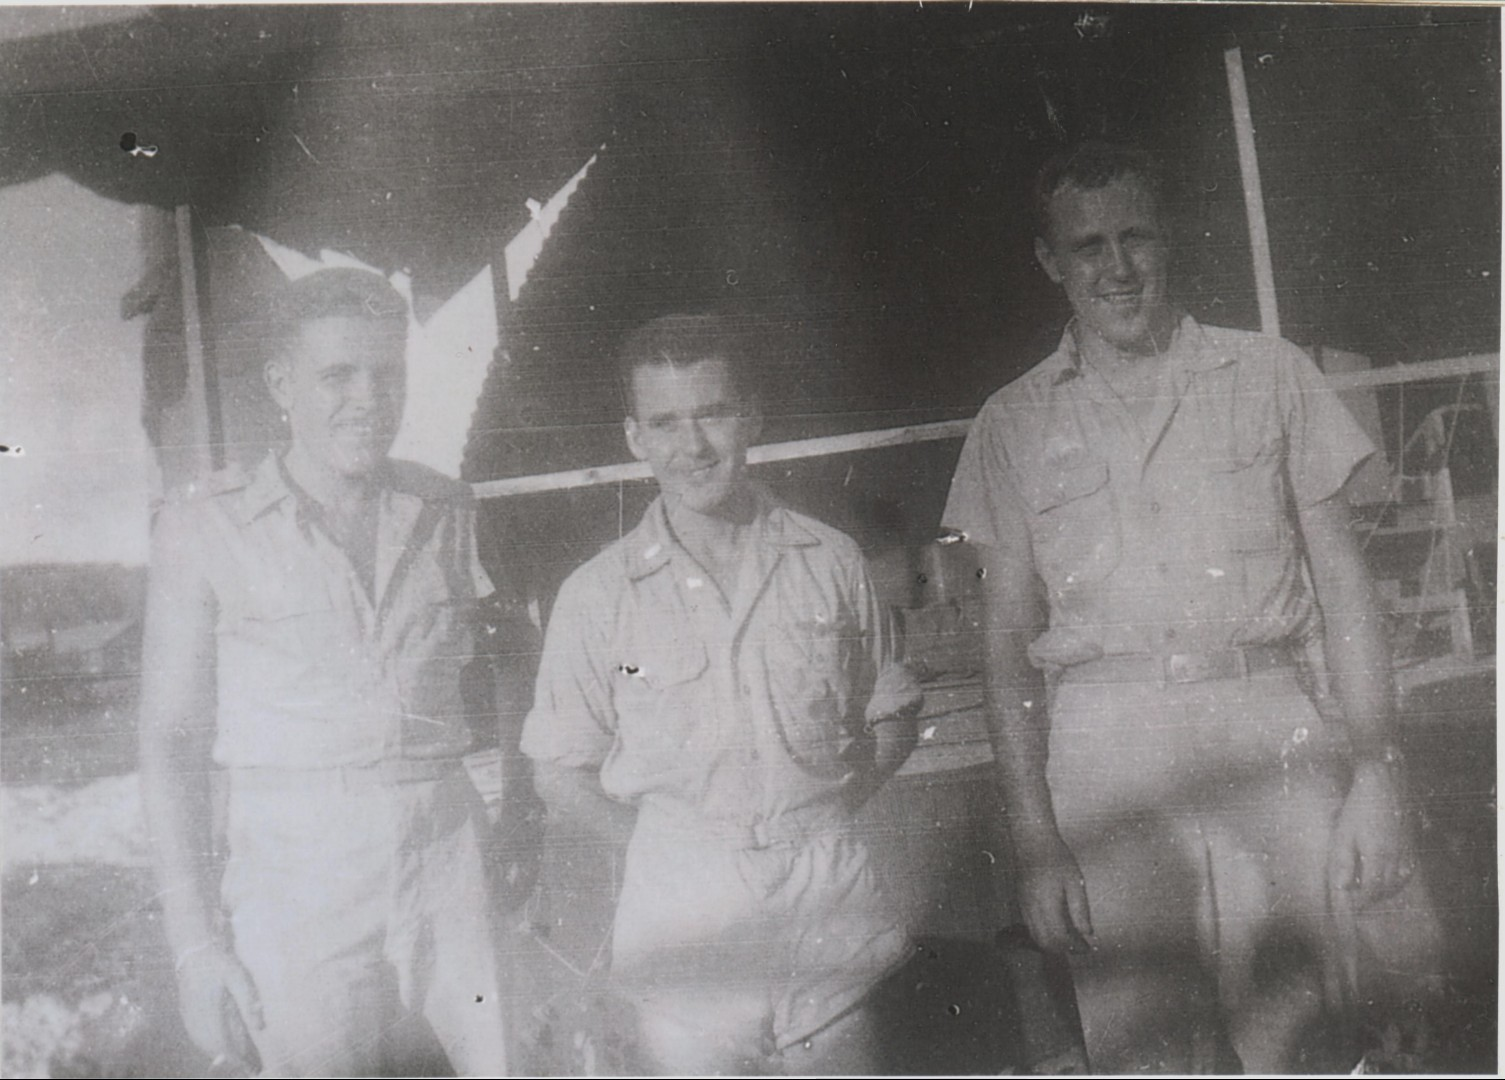 Pilot_2Lt_Wm_H._McClure,_AC_1LtLeonard_Hughes_and_2Lt_Kenneth_F_Fine (.jpg